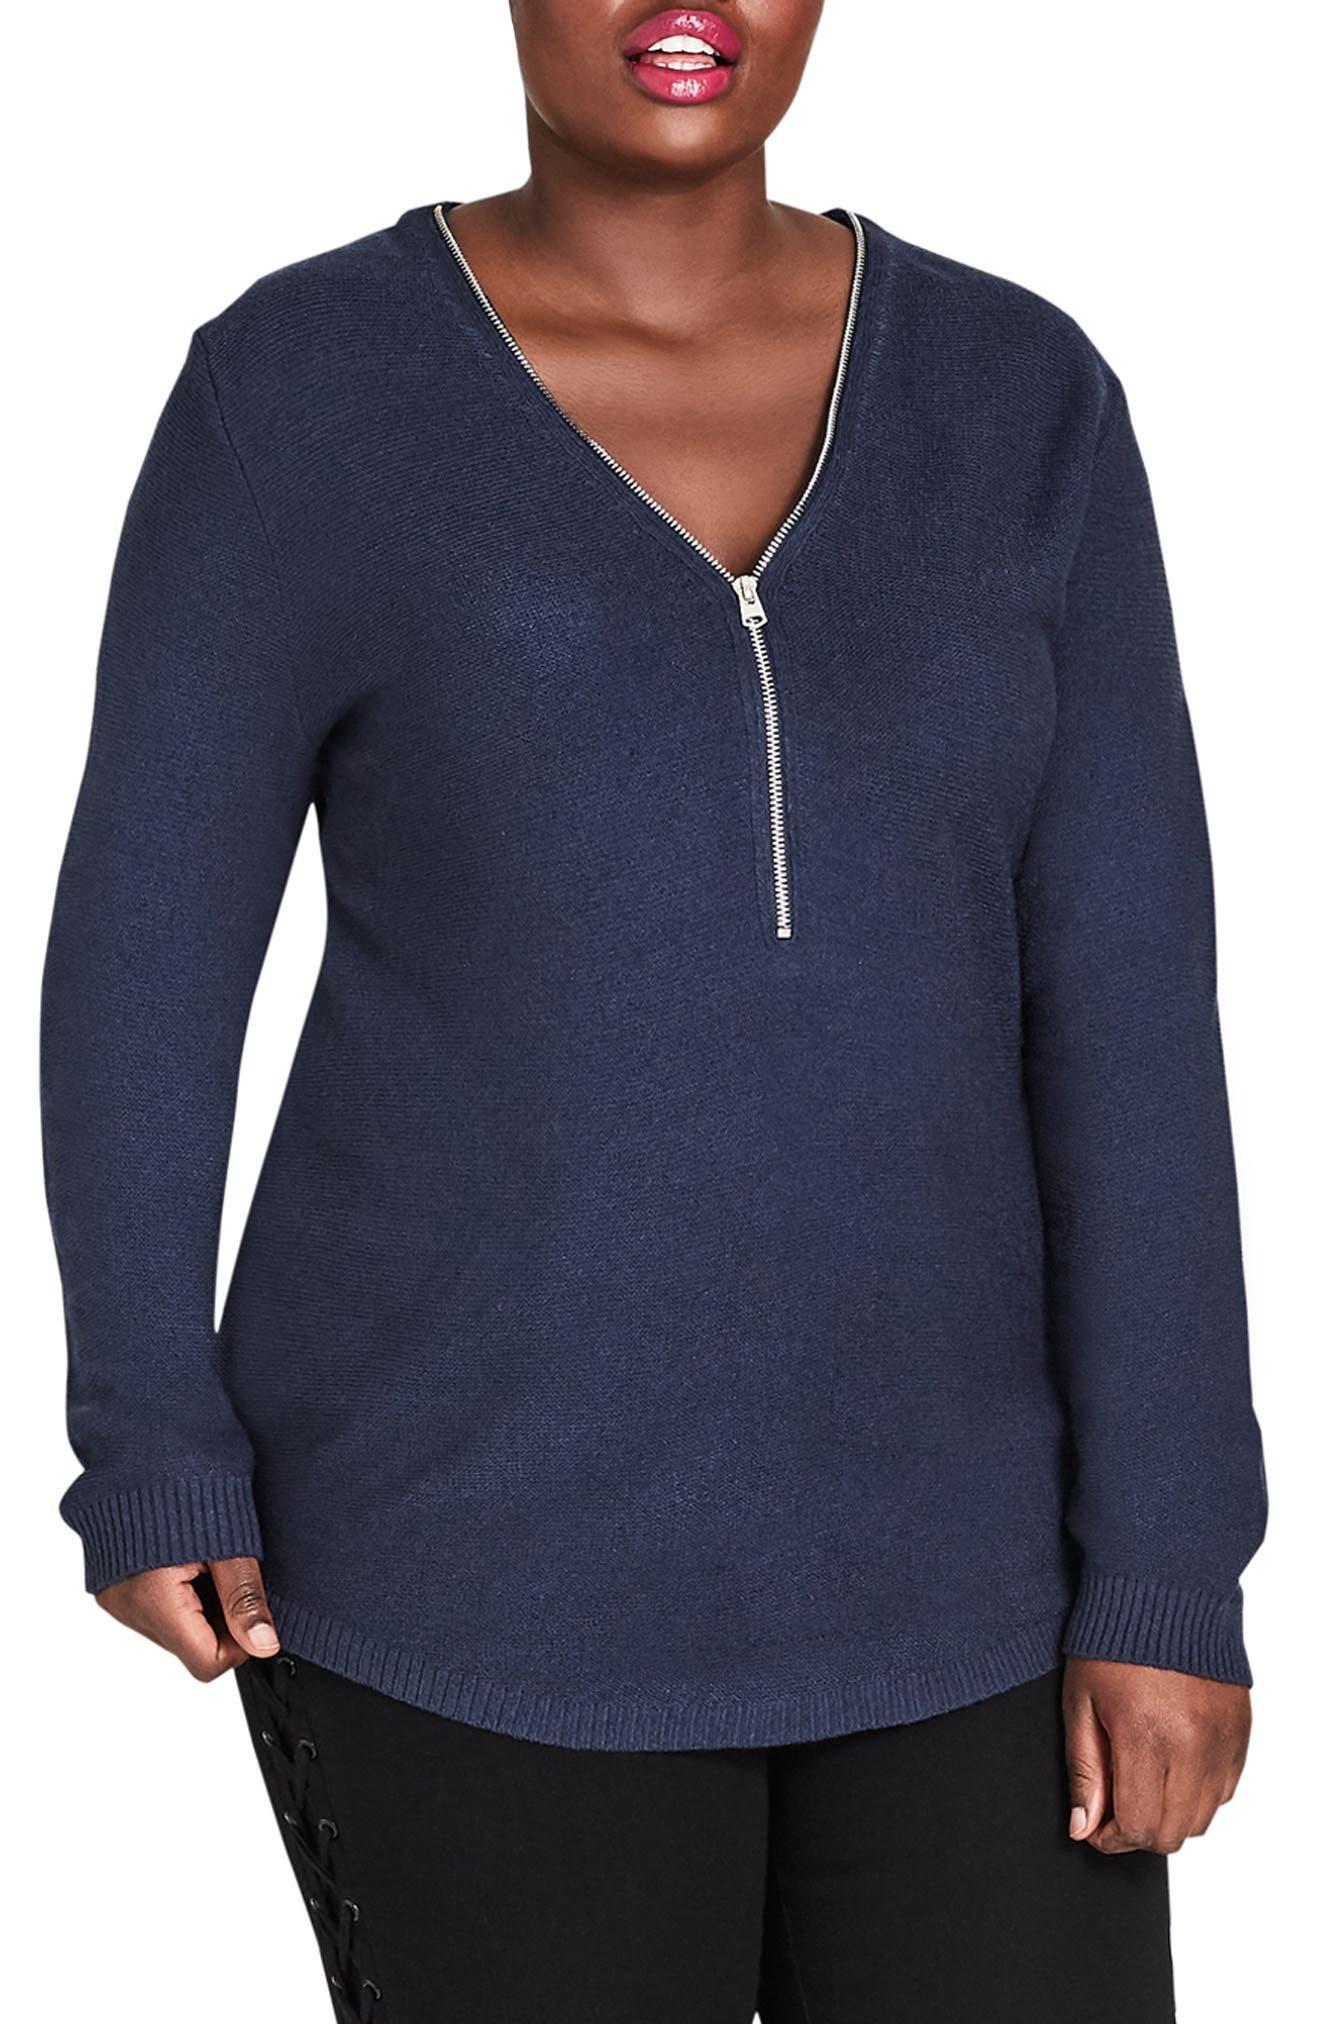 Plus Size City Chic Zip Trim Sweater